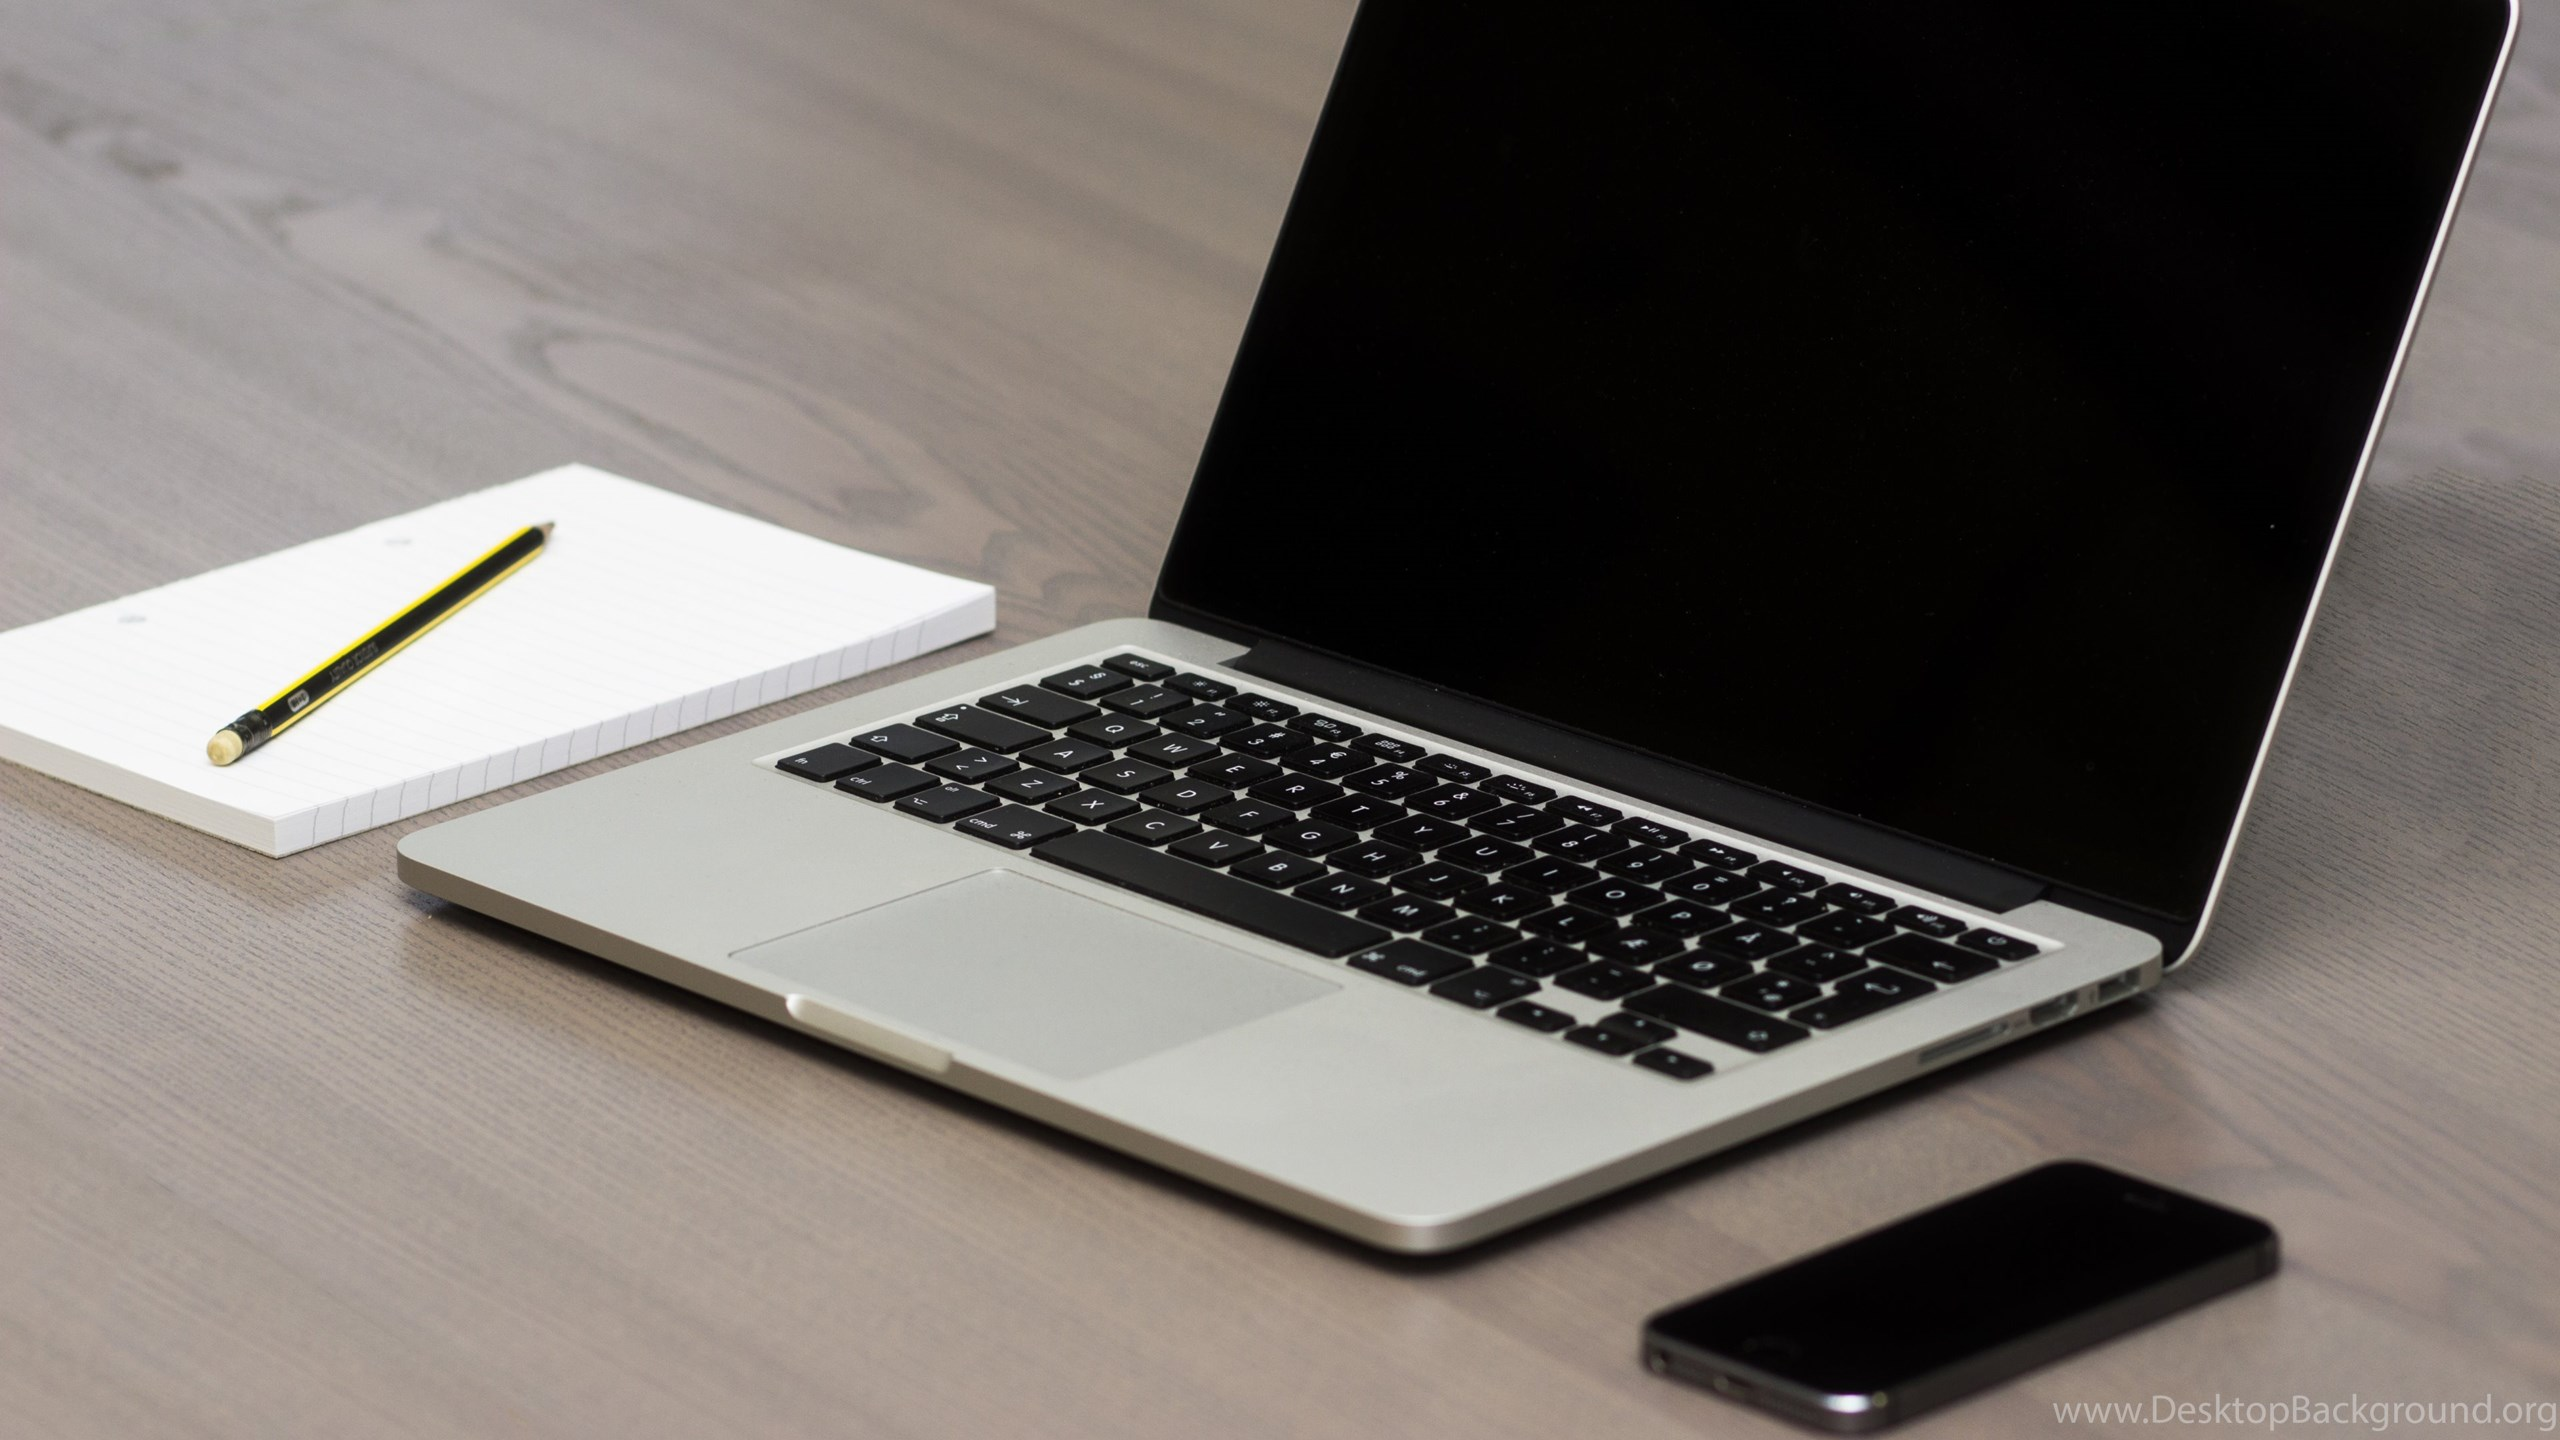 Ultra HD 4K Macbook Pro Wallpapers Desktop Backgrounds 3840x2400